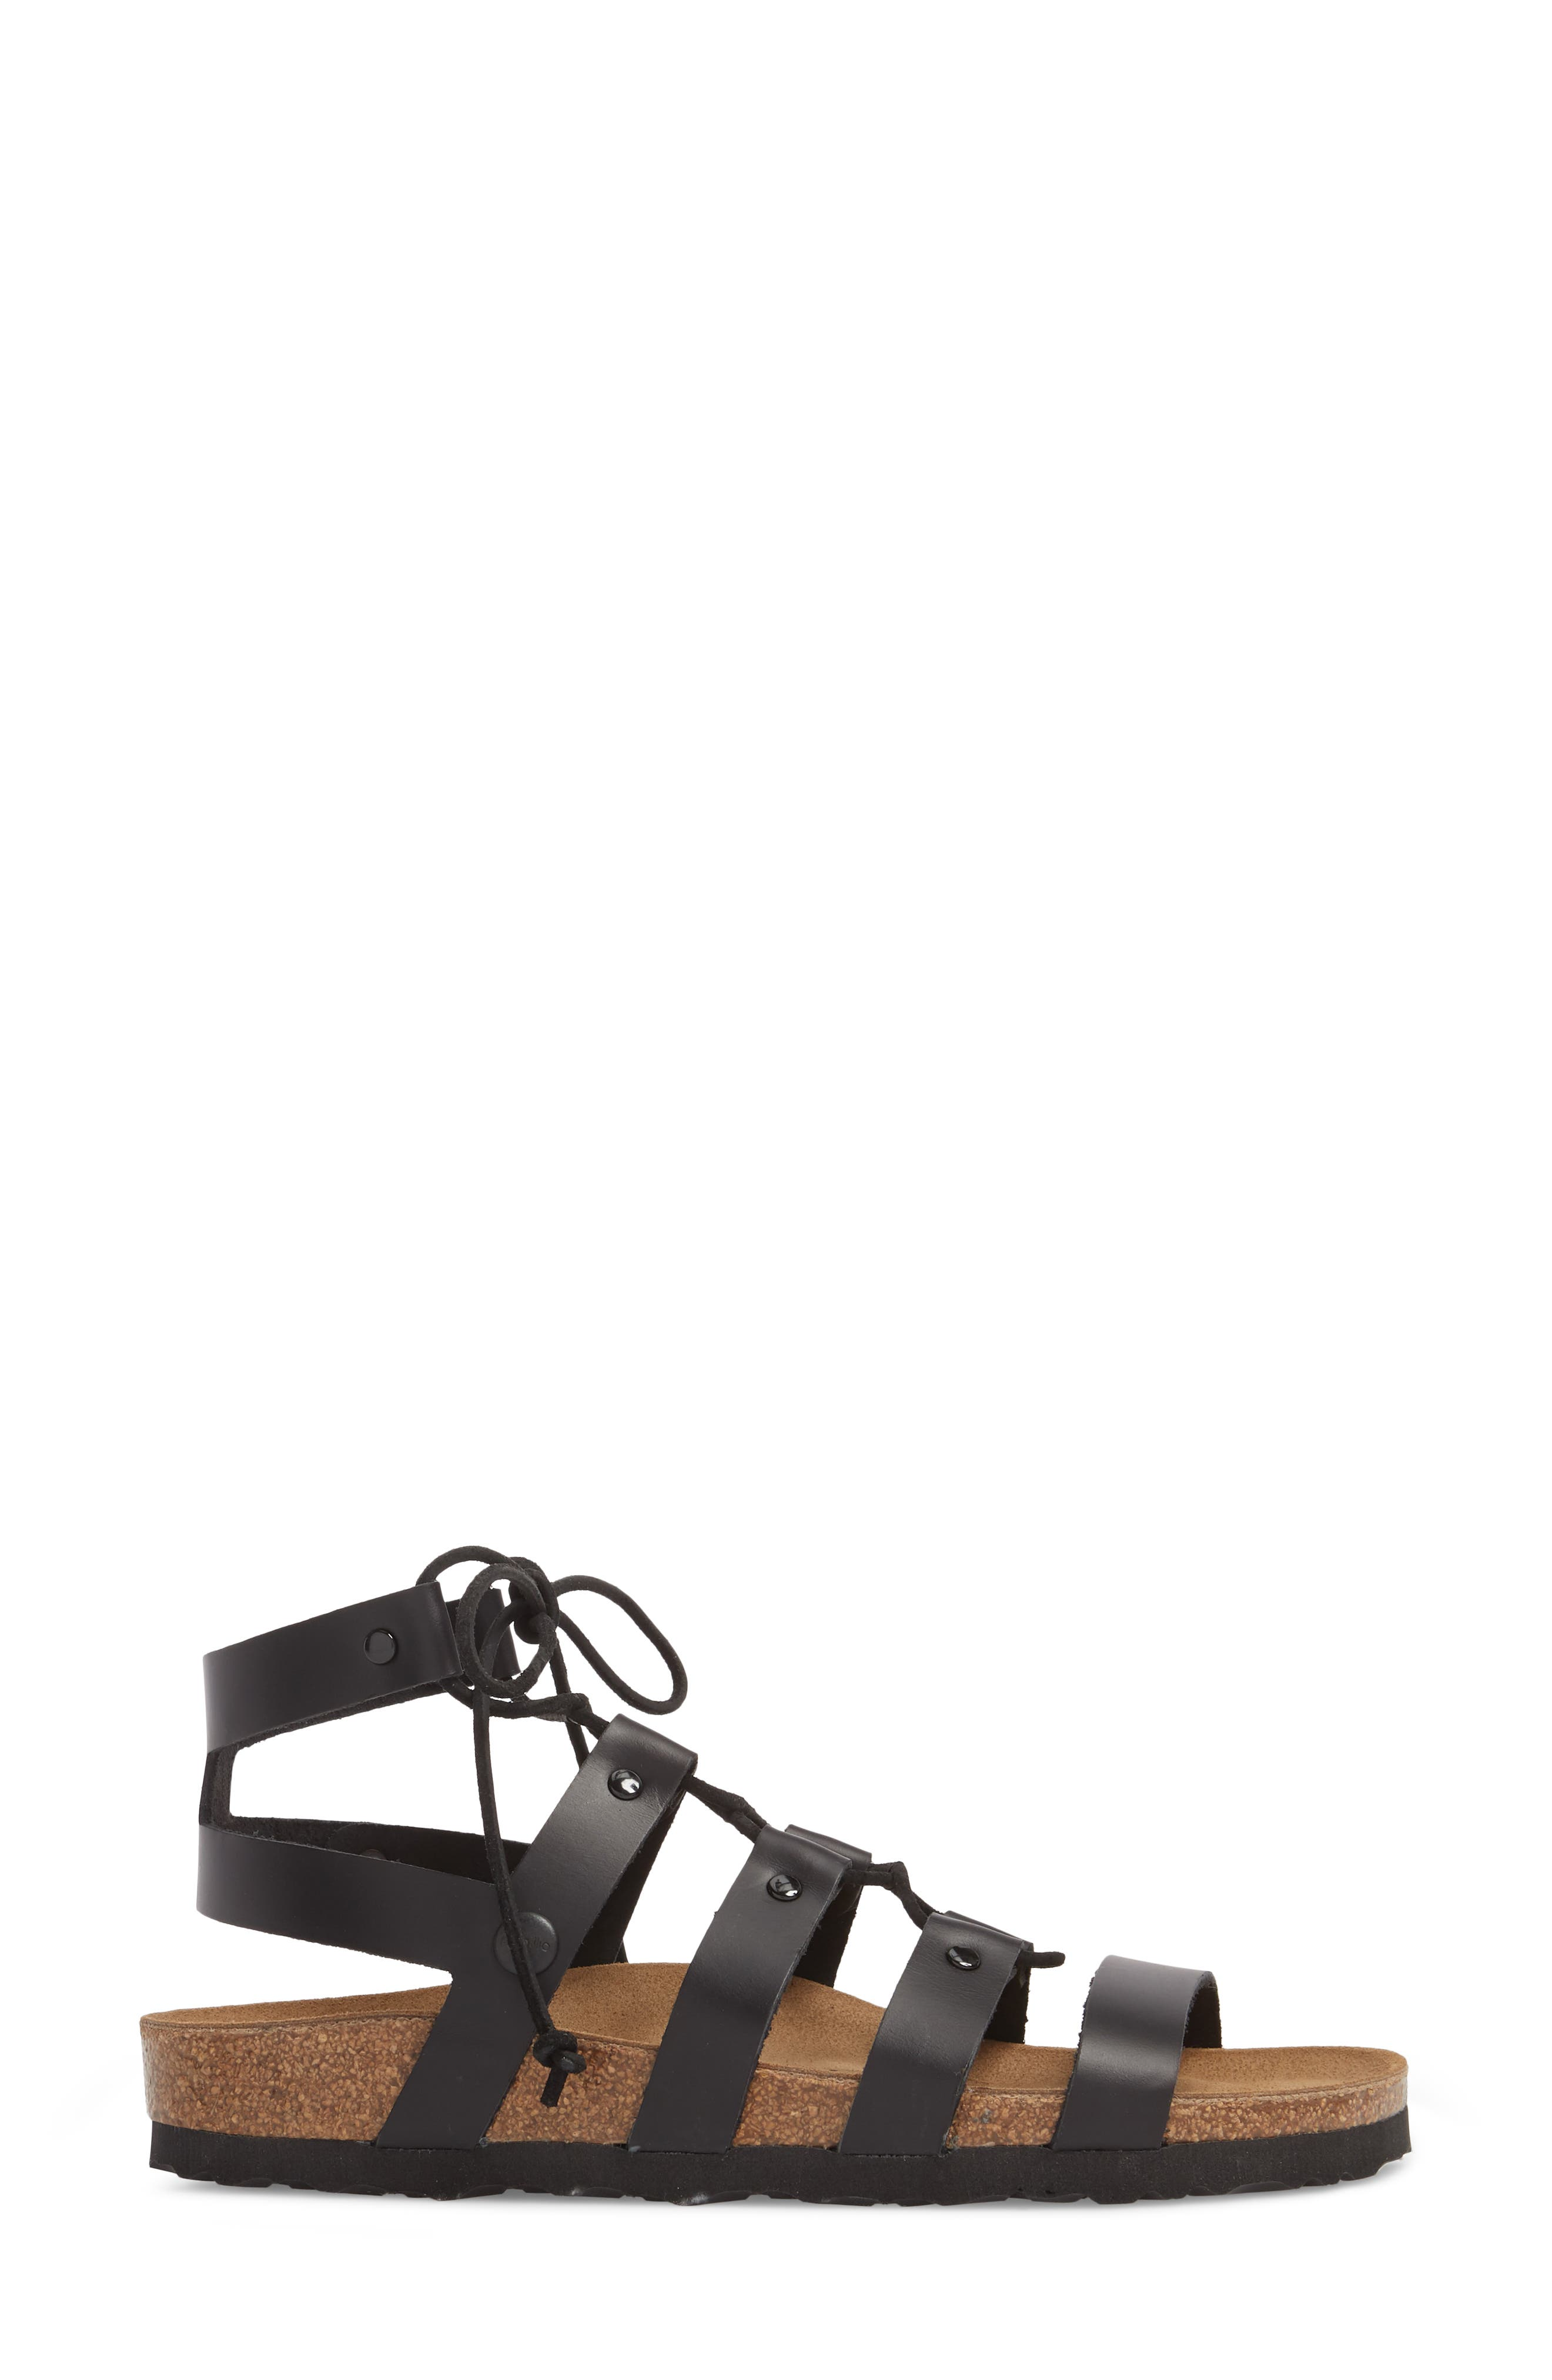 Papillio by Birkenstock Cleo Gladiator Sandal,                             Alternate thumbnail 3, color,                             001